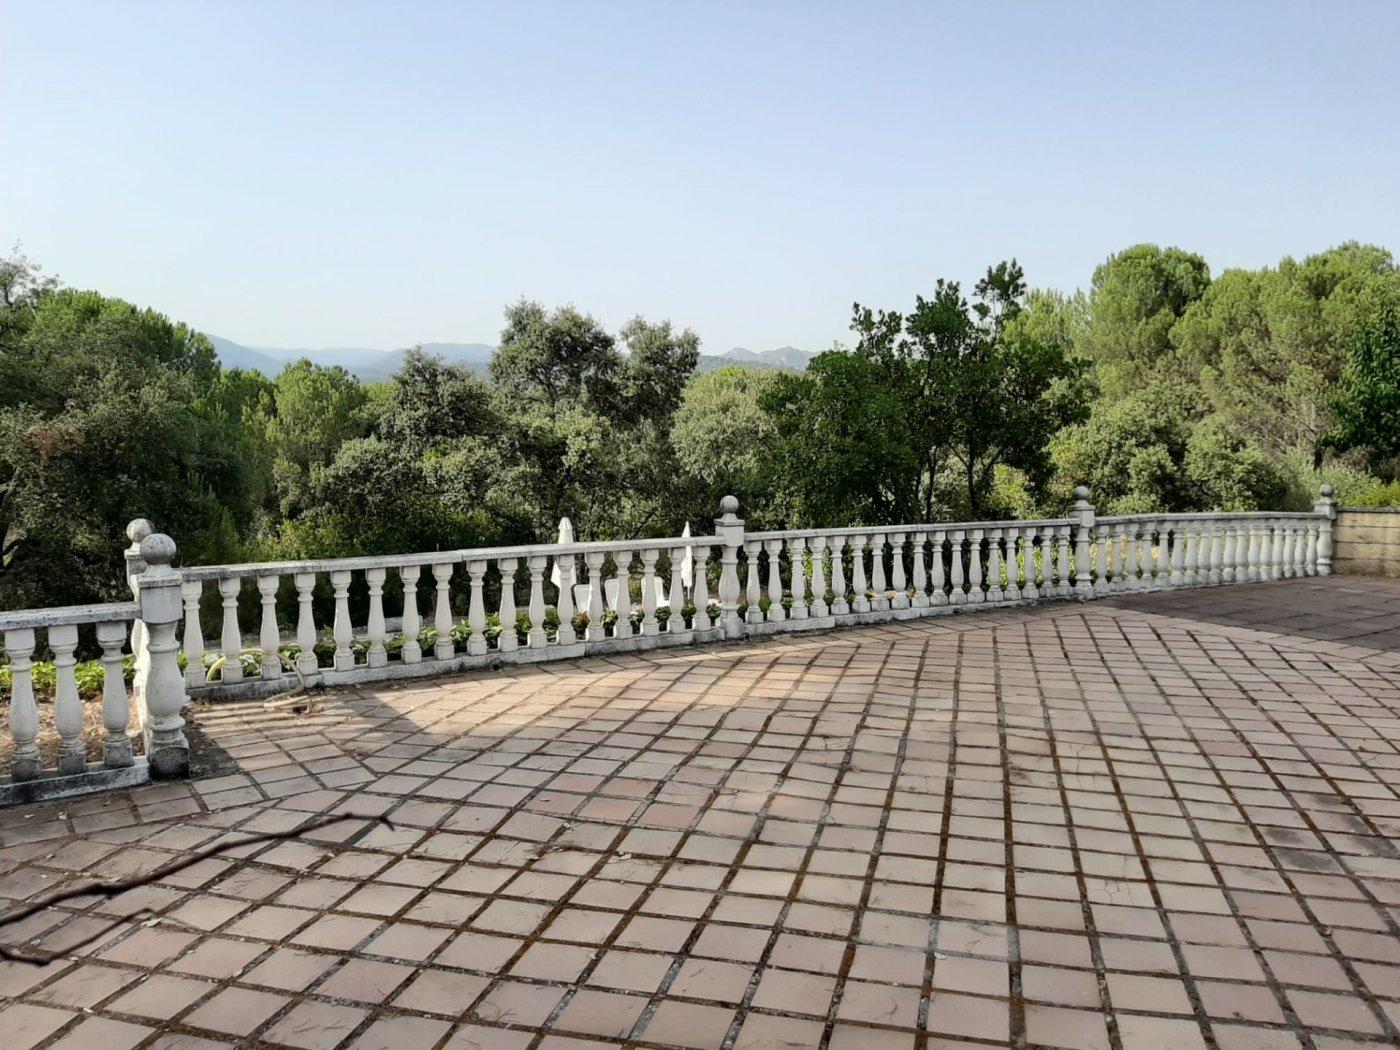 Estupenda casa con piscina propia en zona de assuan- las jaras-cÓrdoba. - imagenInmueble3